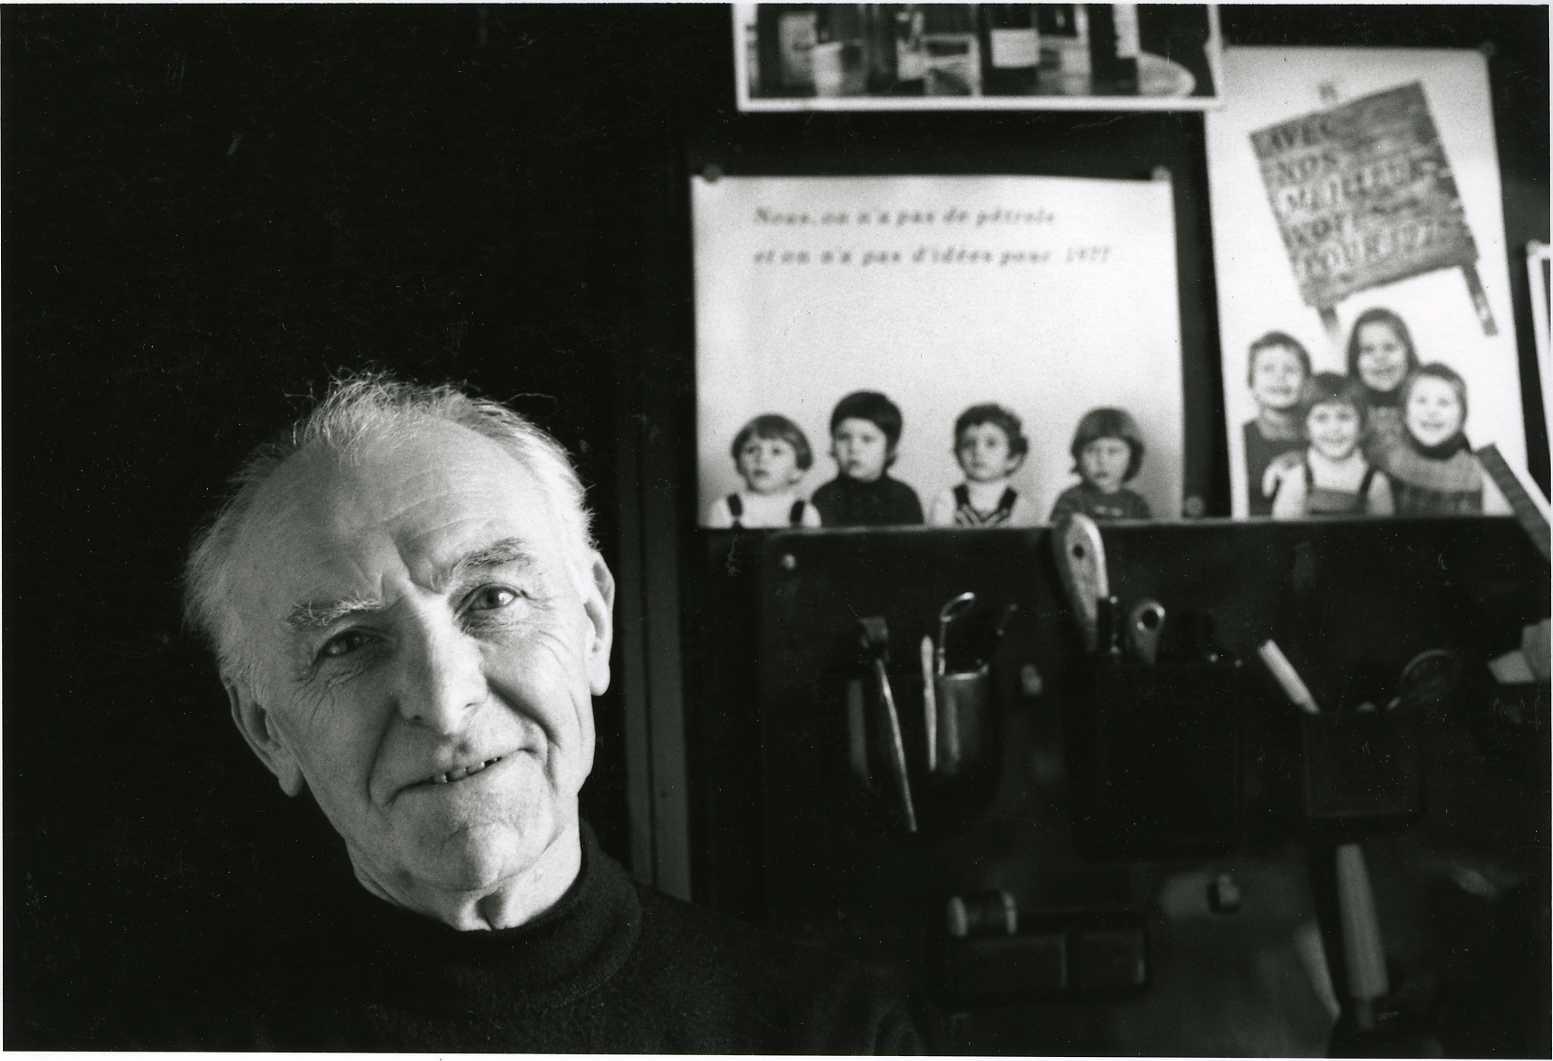 Retrospective Robert Doisneau